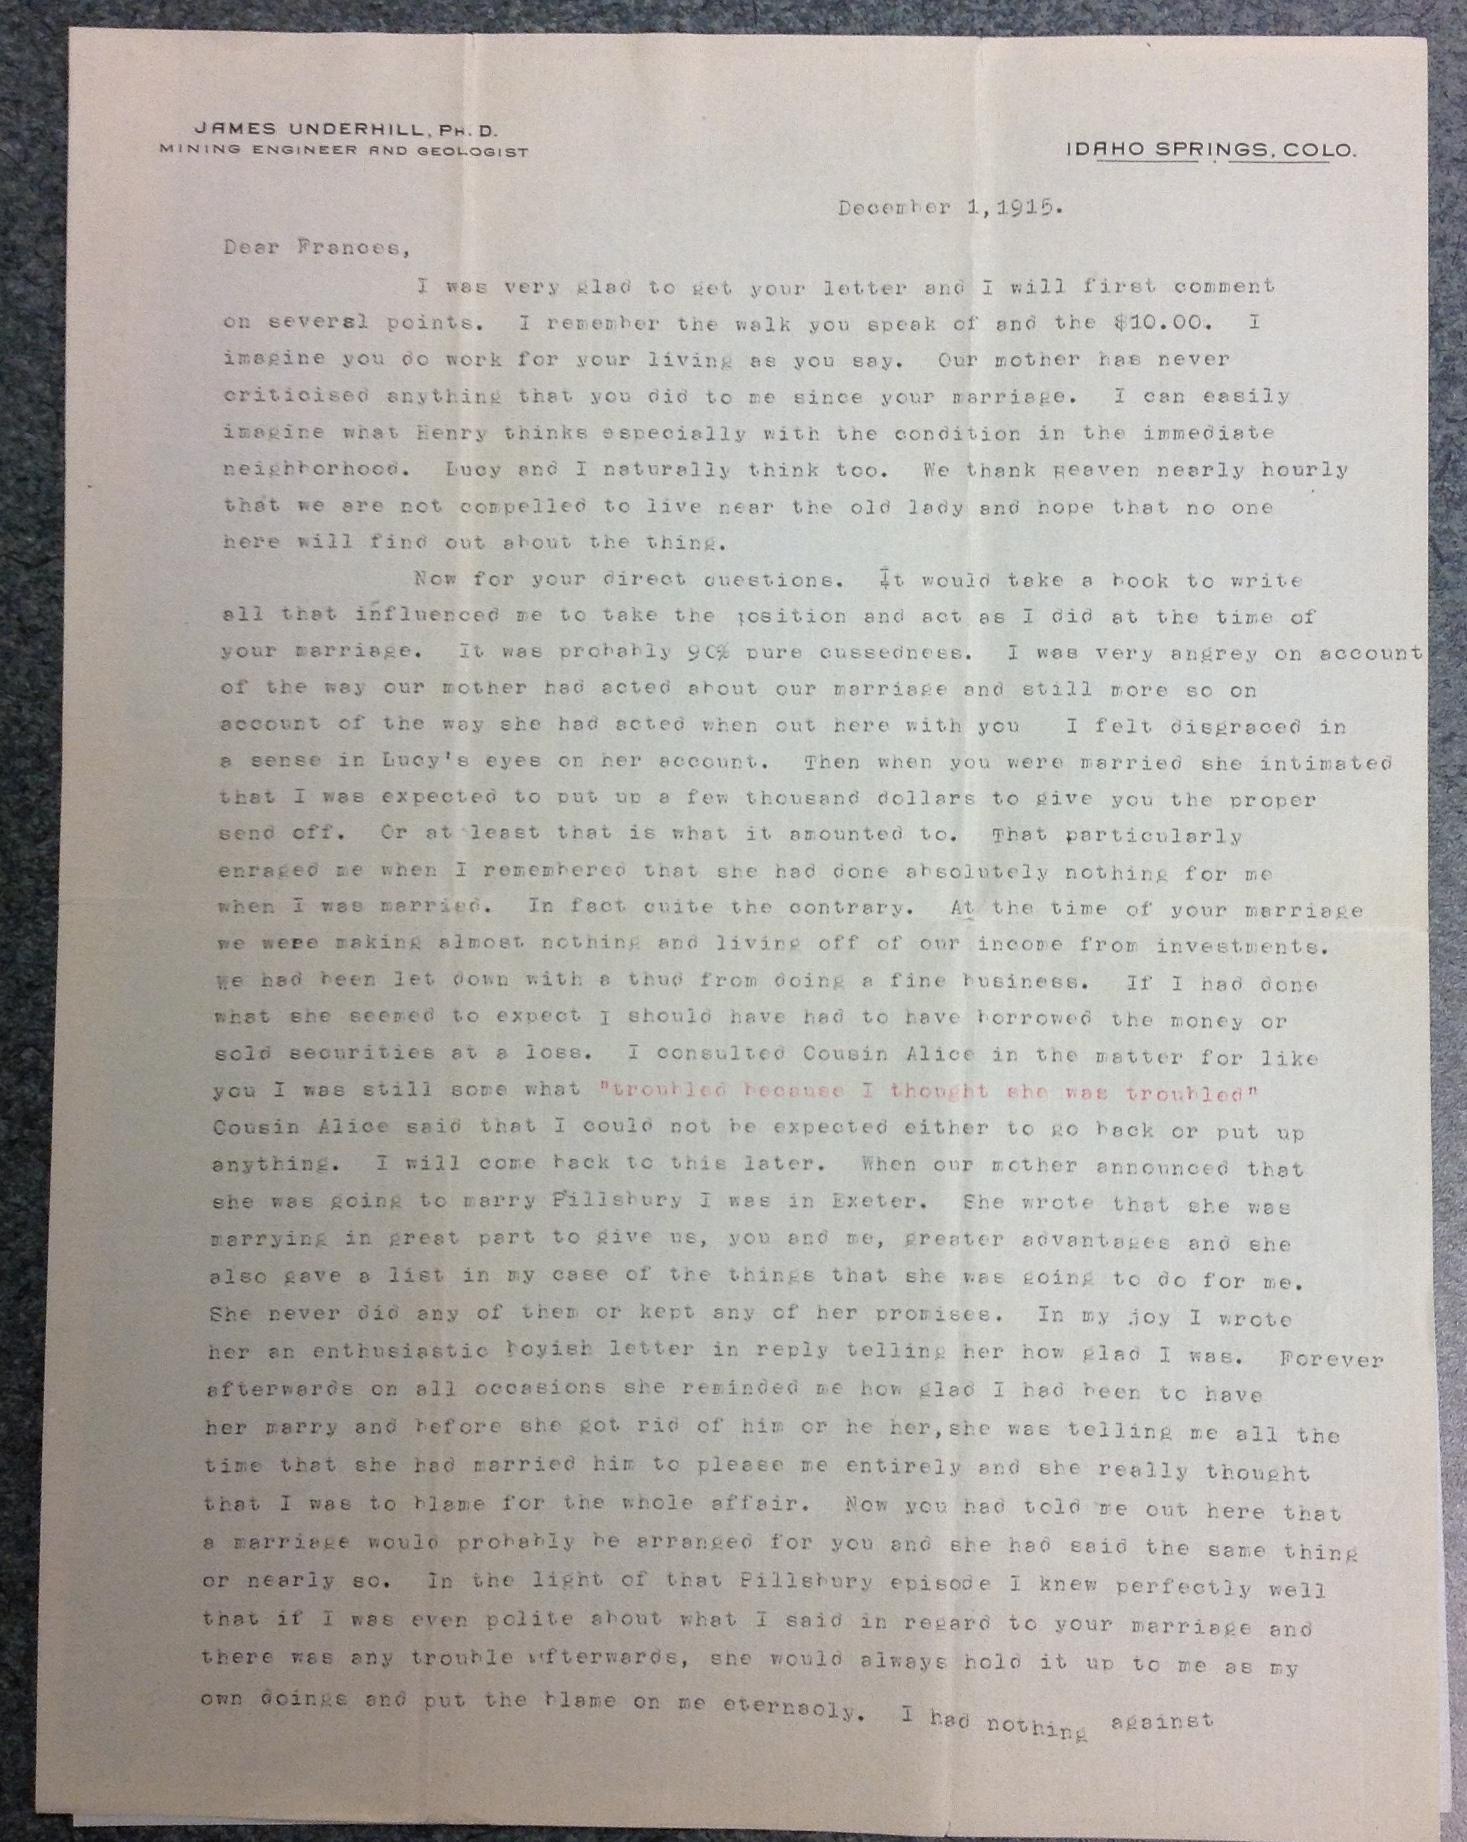 James Underhill to FPK, December 1, 1915